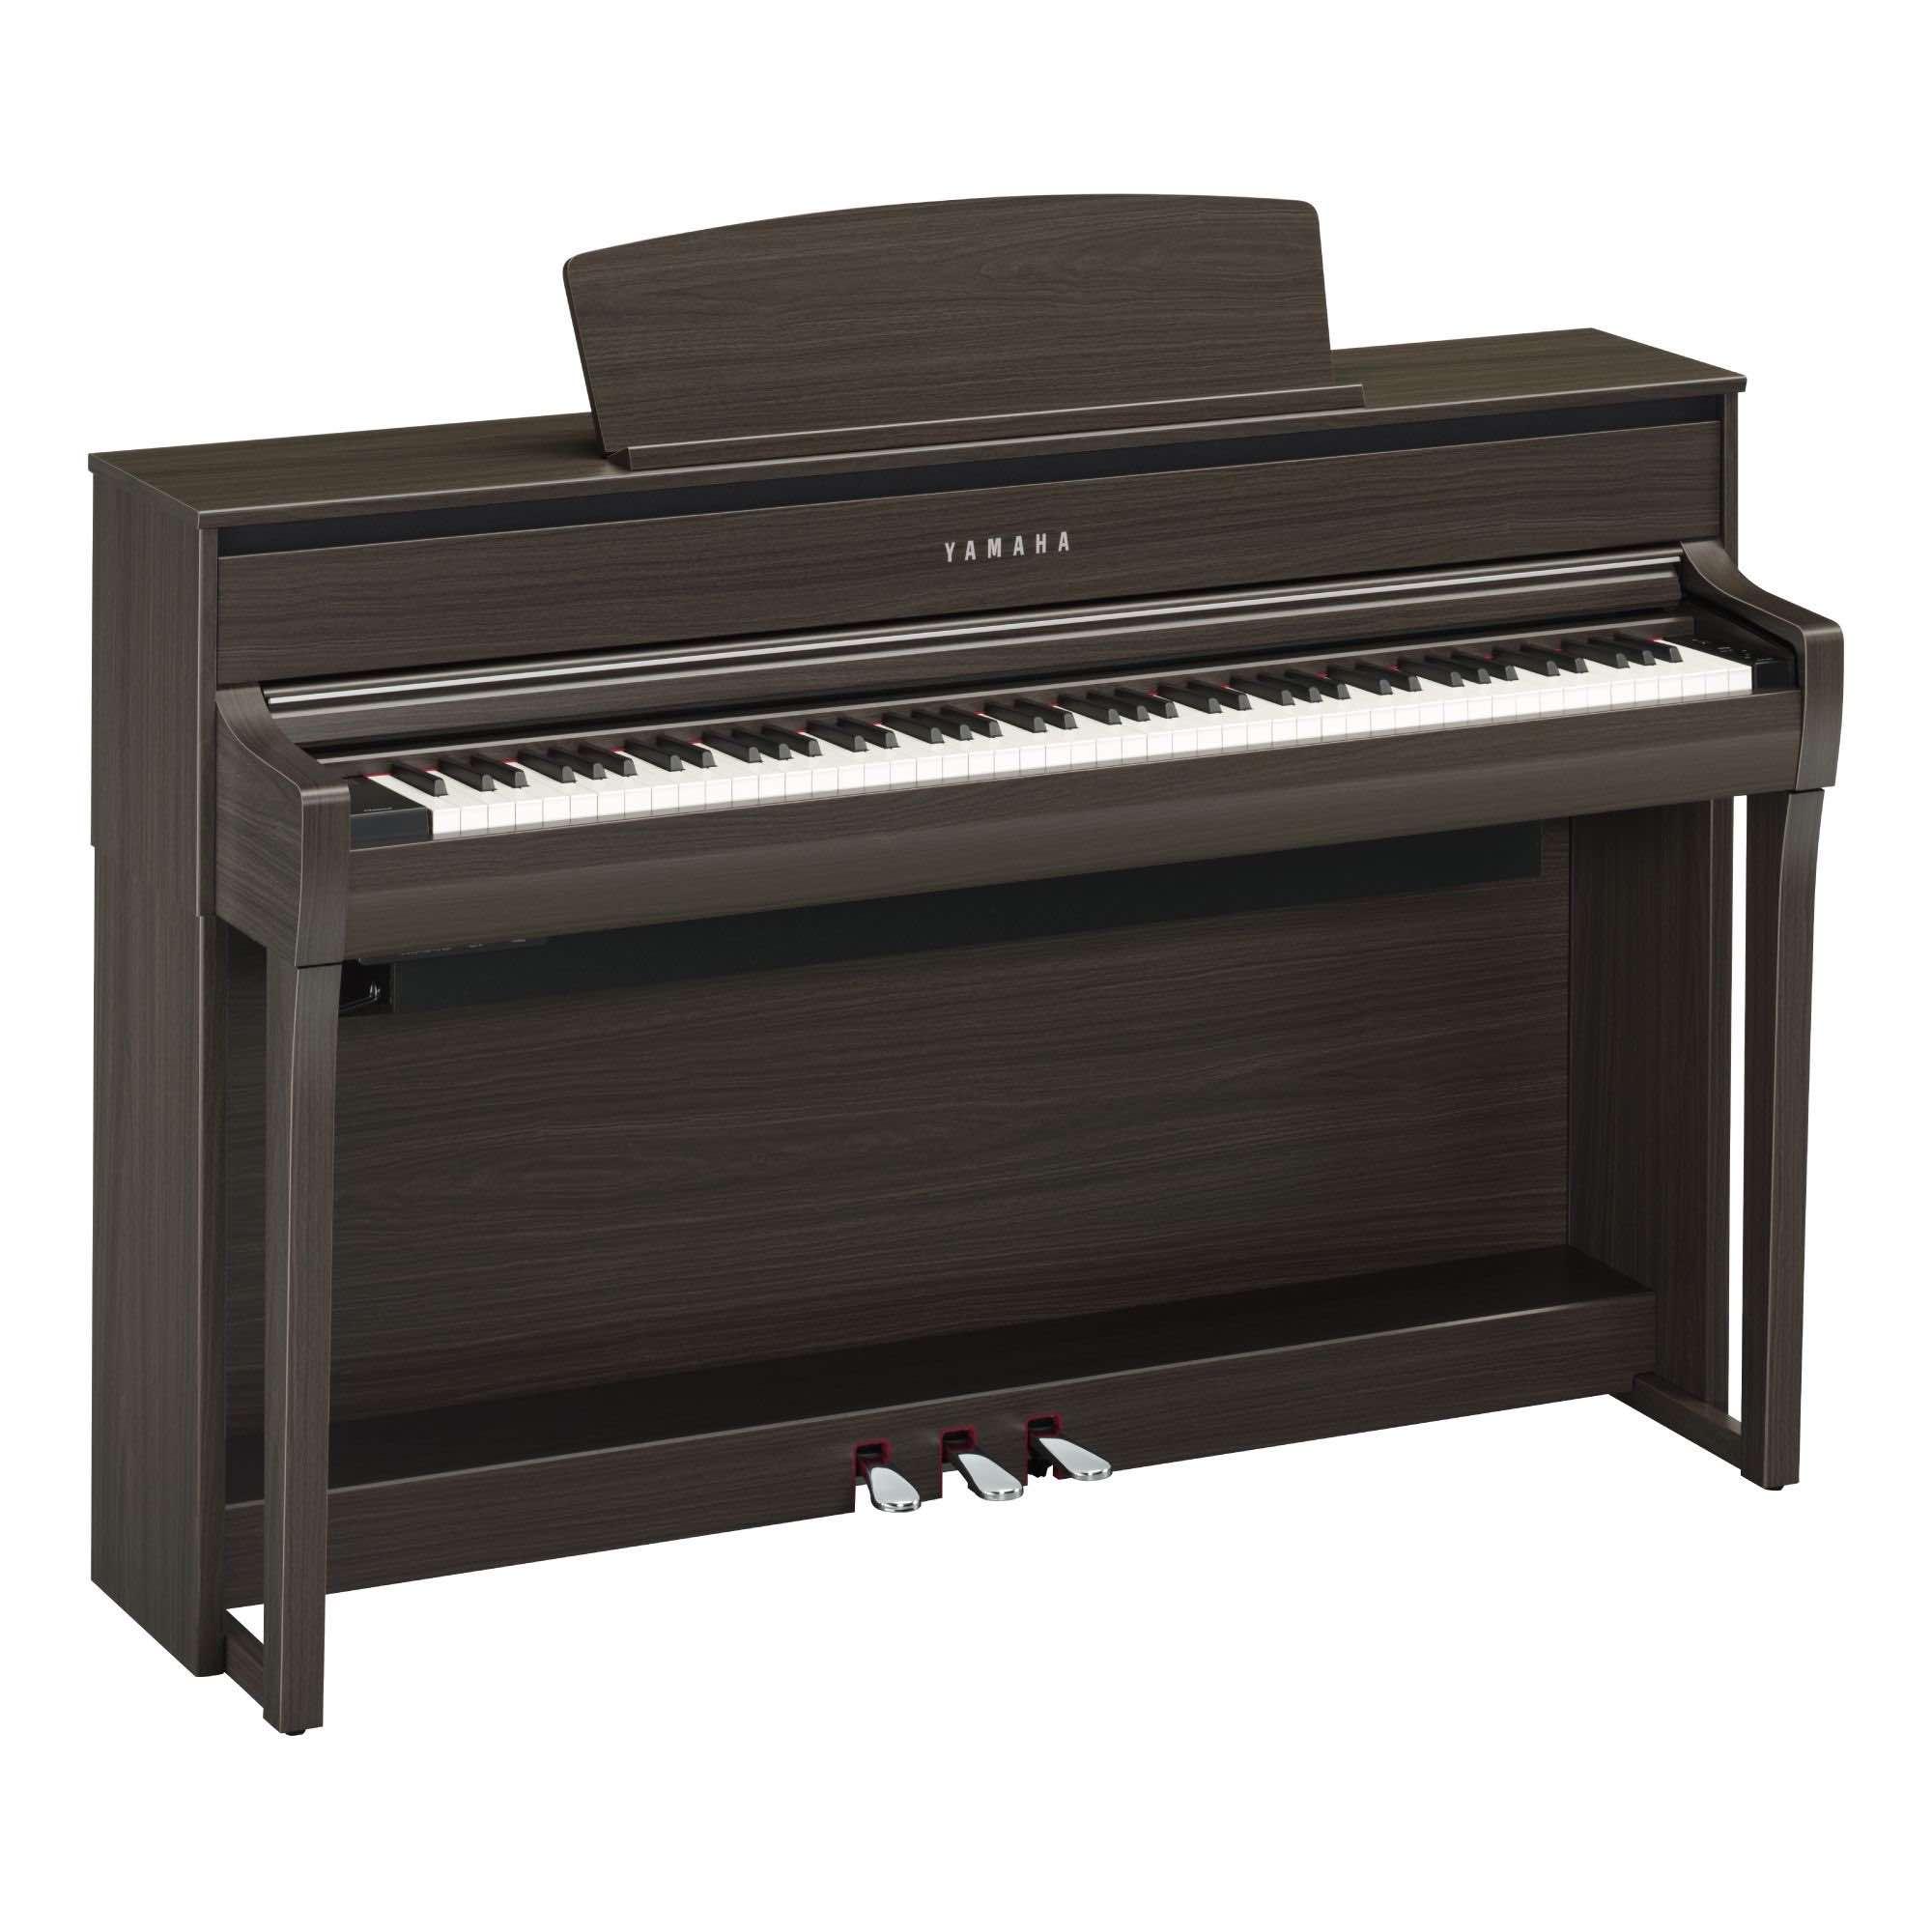 Yamaha clp-775 Clavinova CLP700 stage digitale keyboard home piano mezza coda muro strumenti musicali